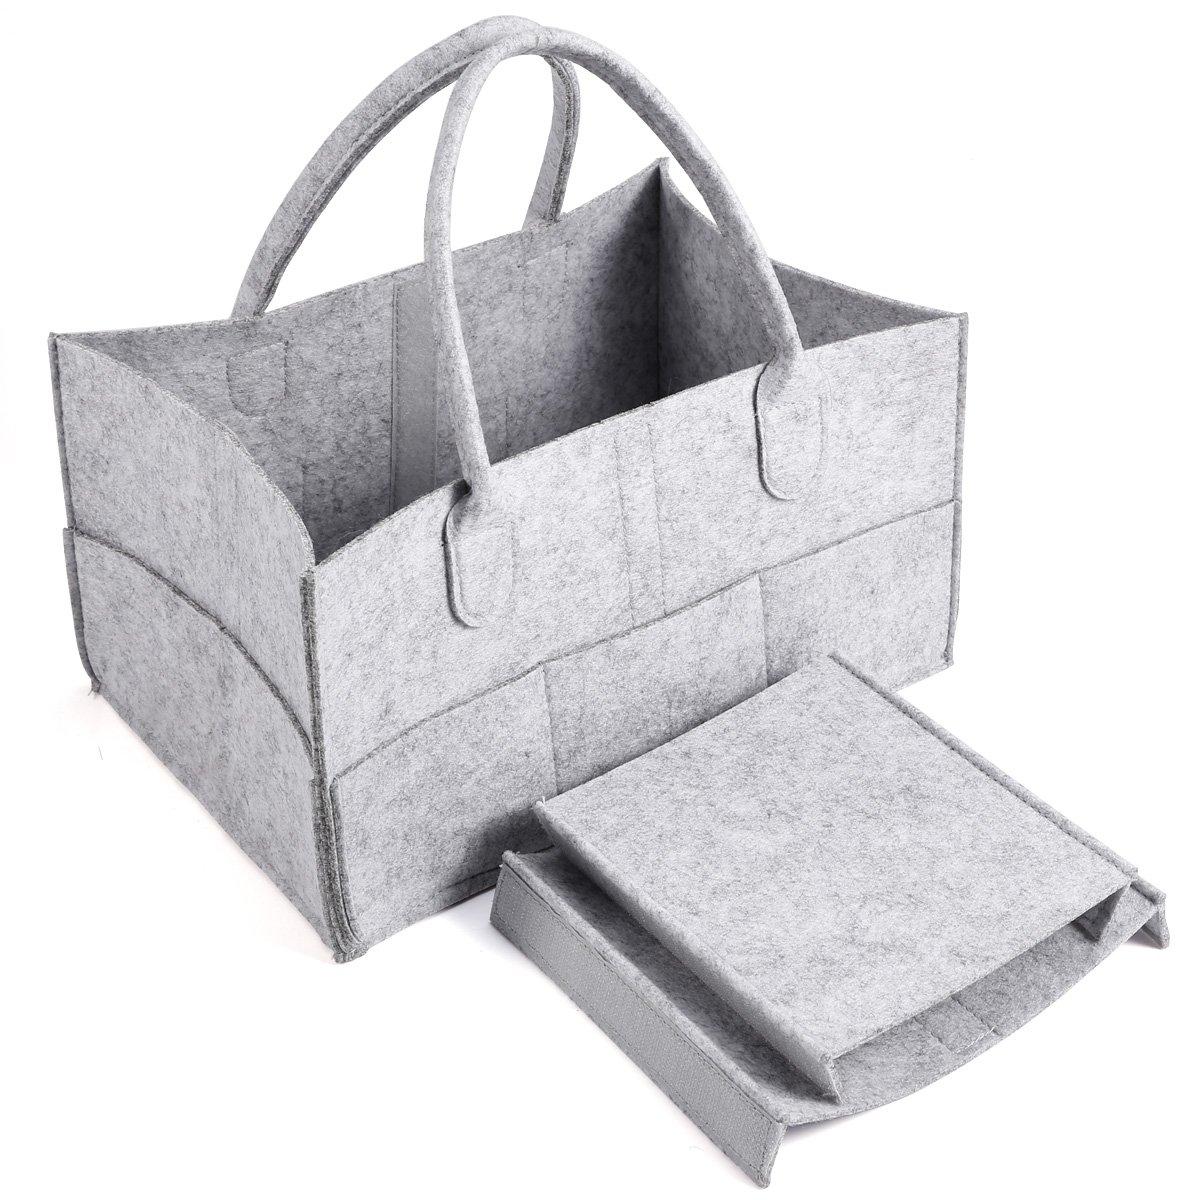 Anladia 3 Compartments Portable Baby Organizer Bag Diaper Nappy Bottle Changing Divider Storage Handbag Grey